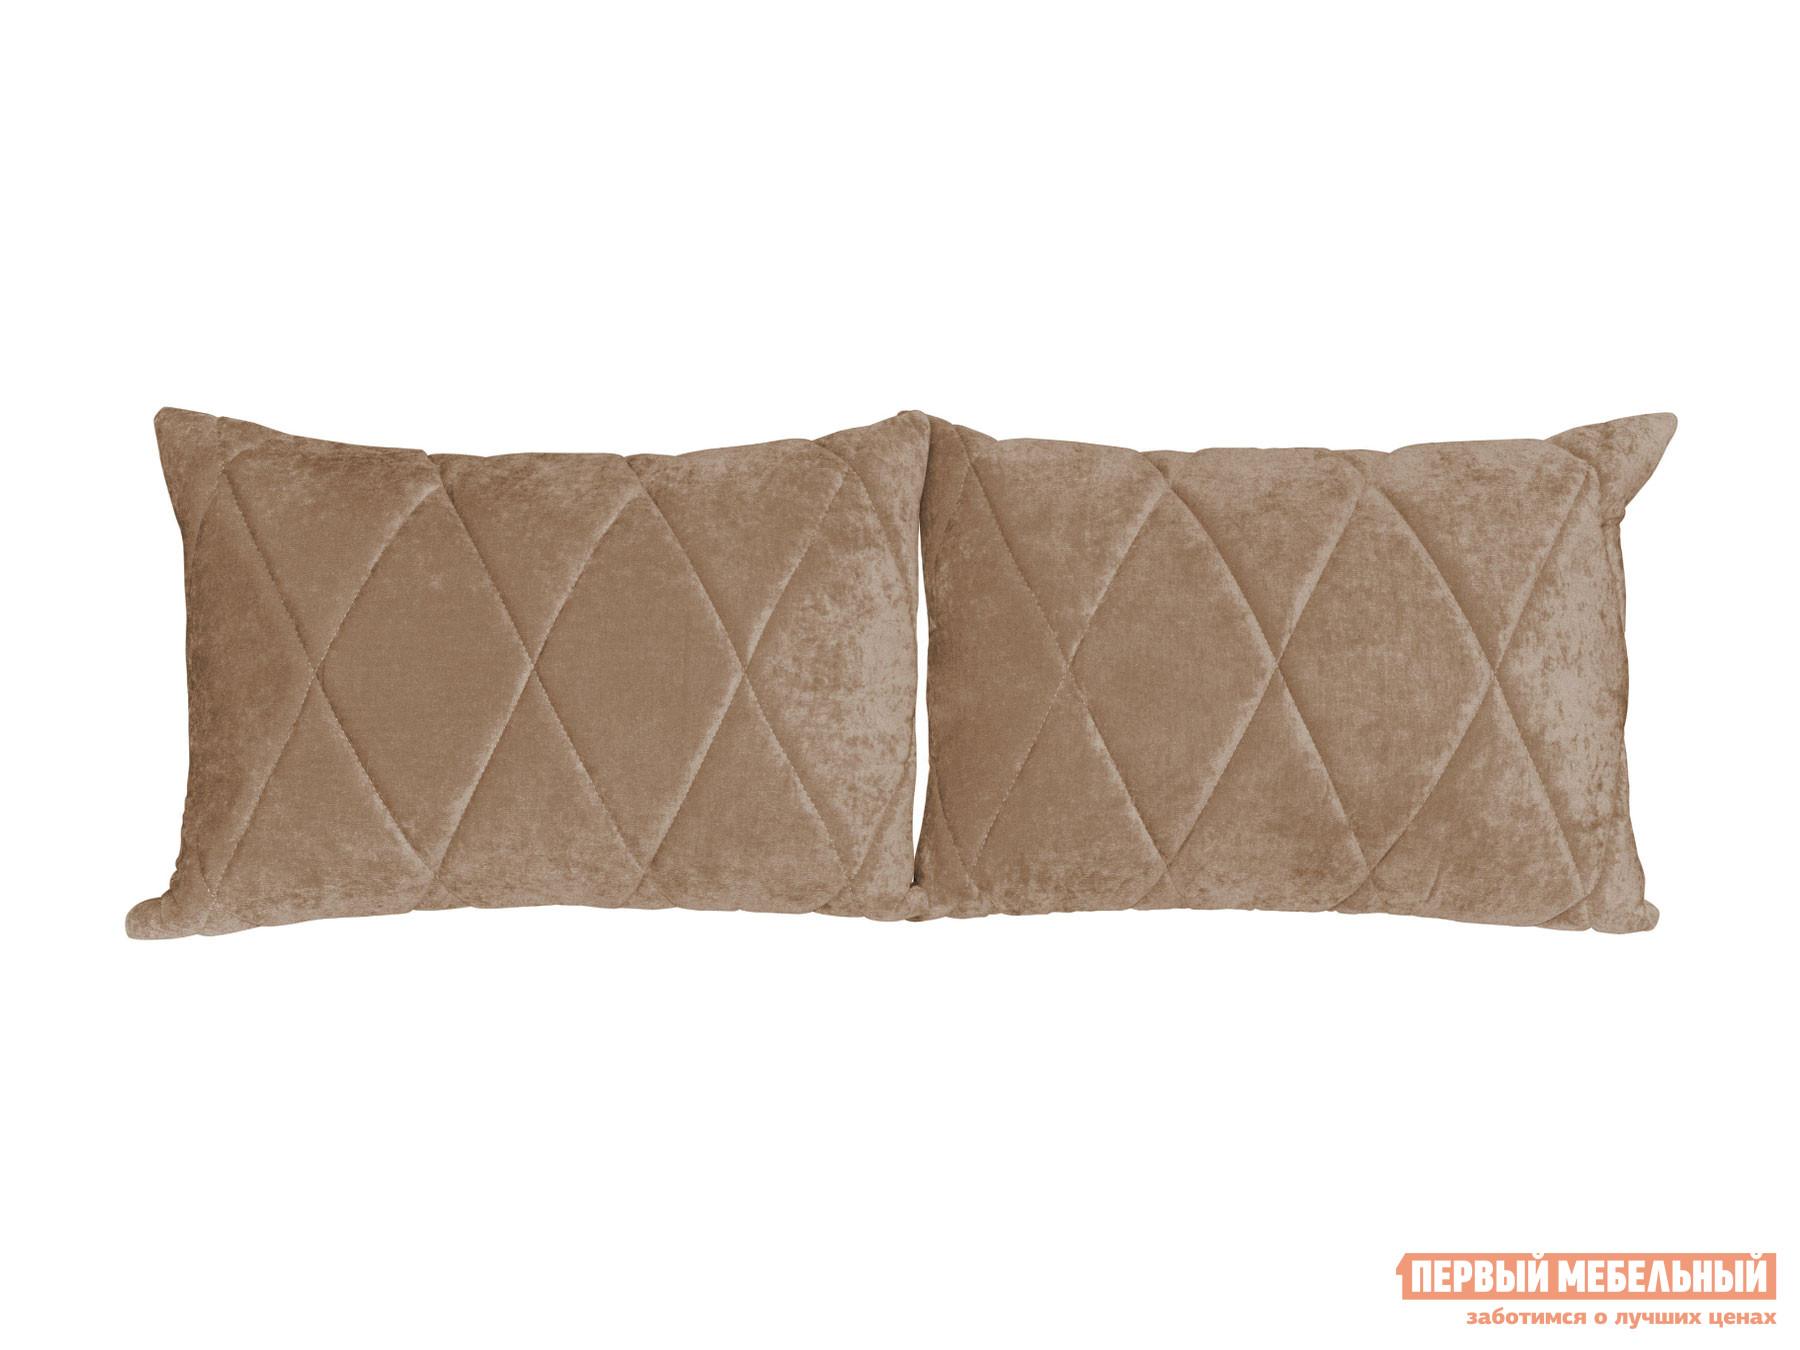 Аксессуар для дивана  Комплект подушек к дивану Роуз Песочный, велюр — Комплект подушек к дивану Роуз Песочный, велюр